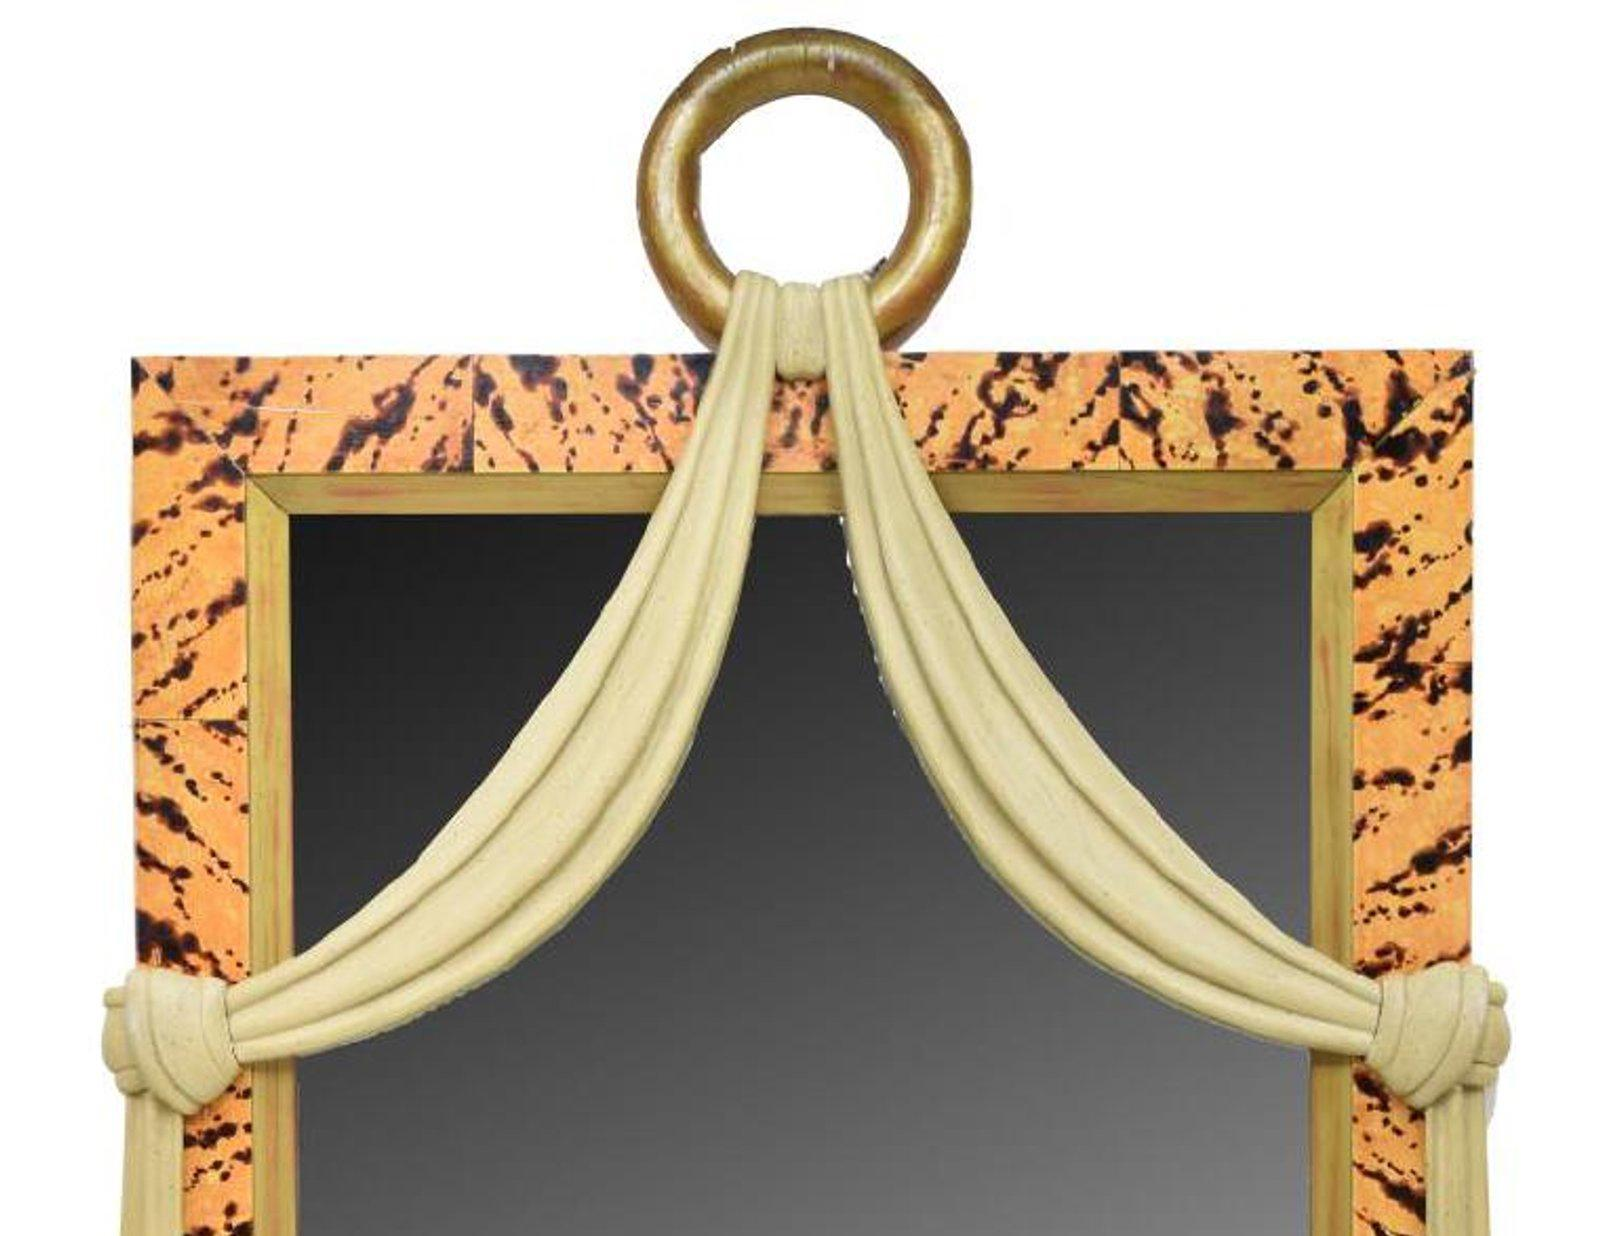 Art Deco Spiegel : Pix italienische art deco stil faux schildpatt geschnitzter holz